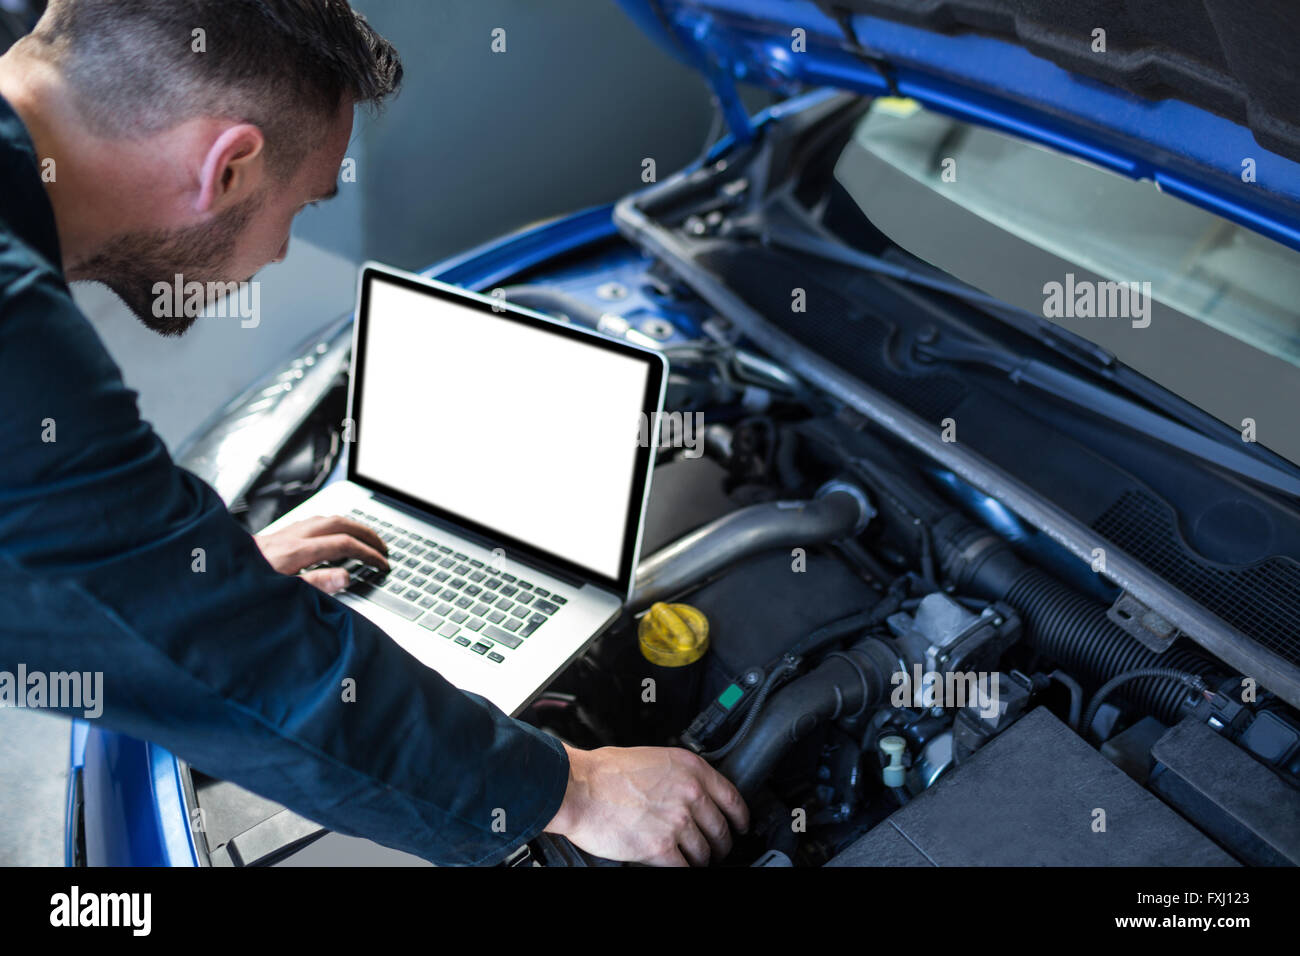 Mechanic examining car engine with help of laptop - Stock Image